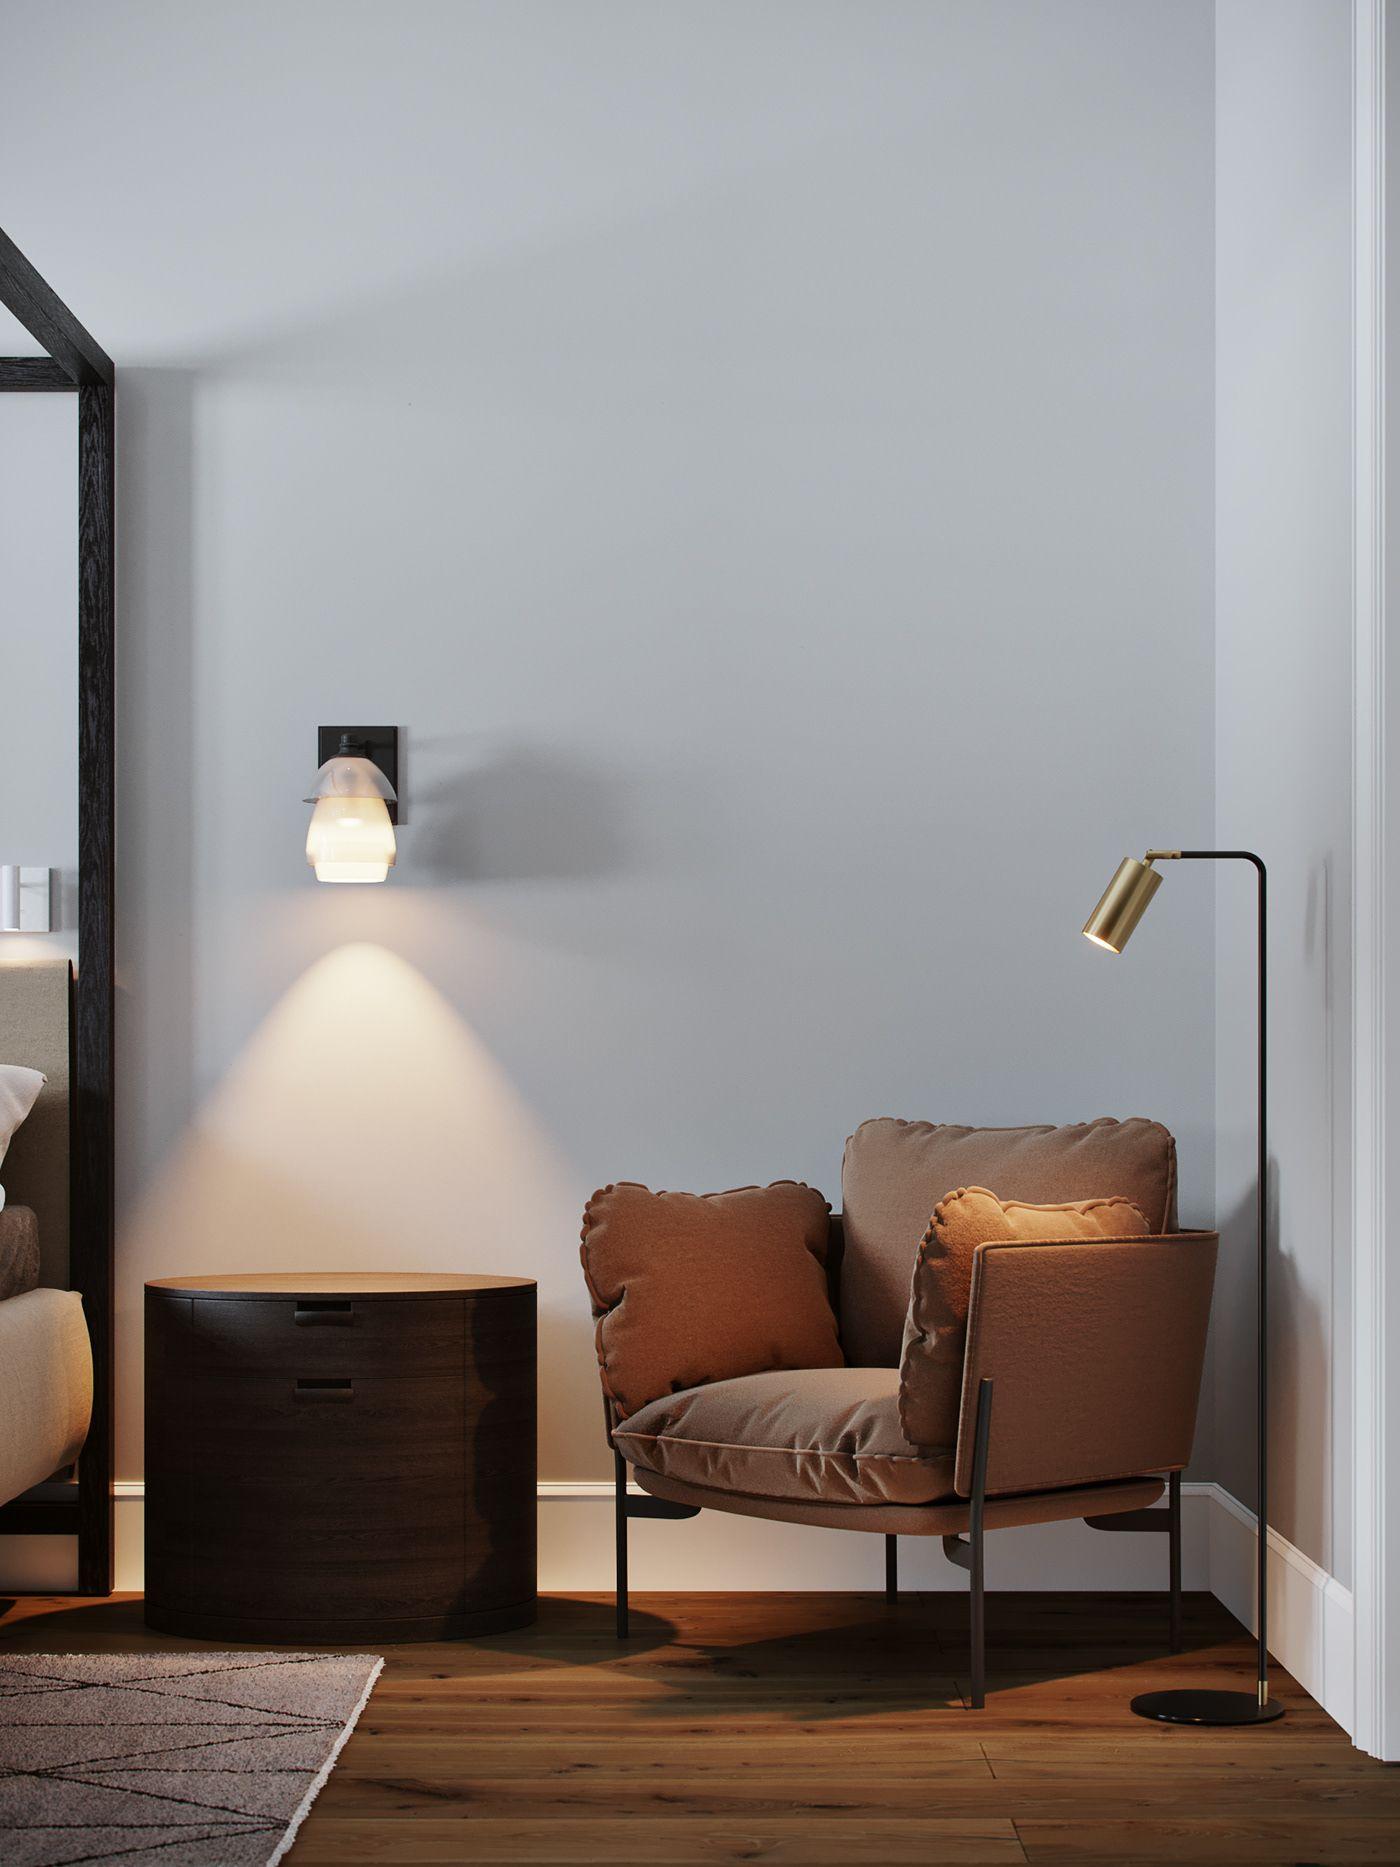 Ø S T Ø J E N K A on Behance Living room corner